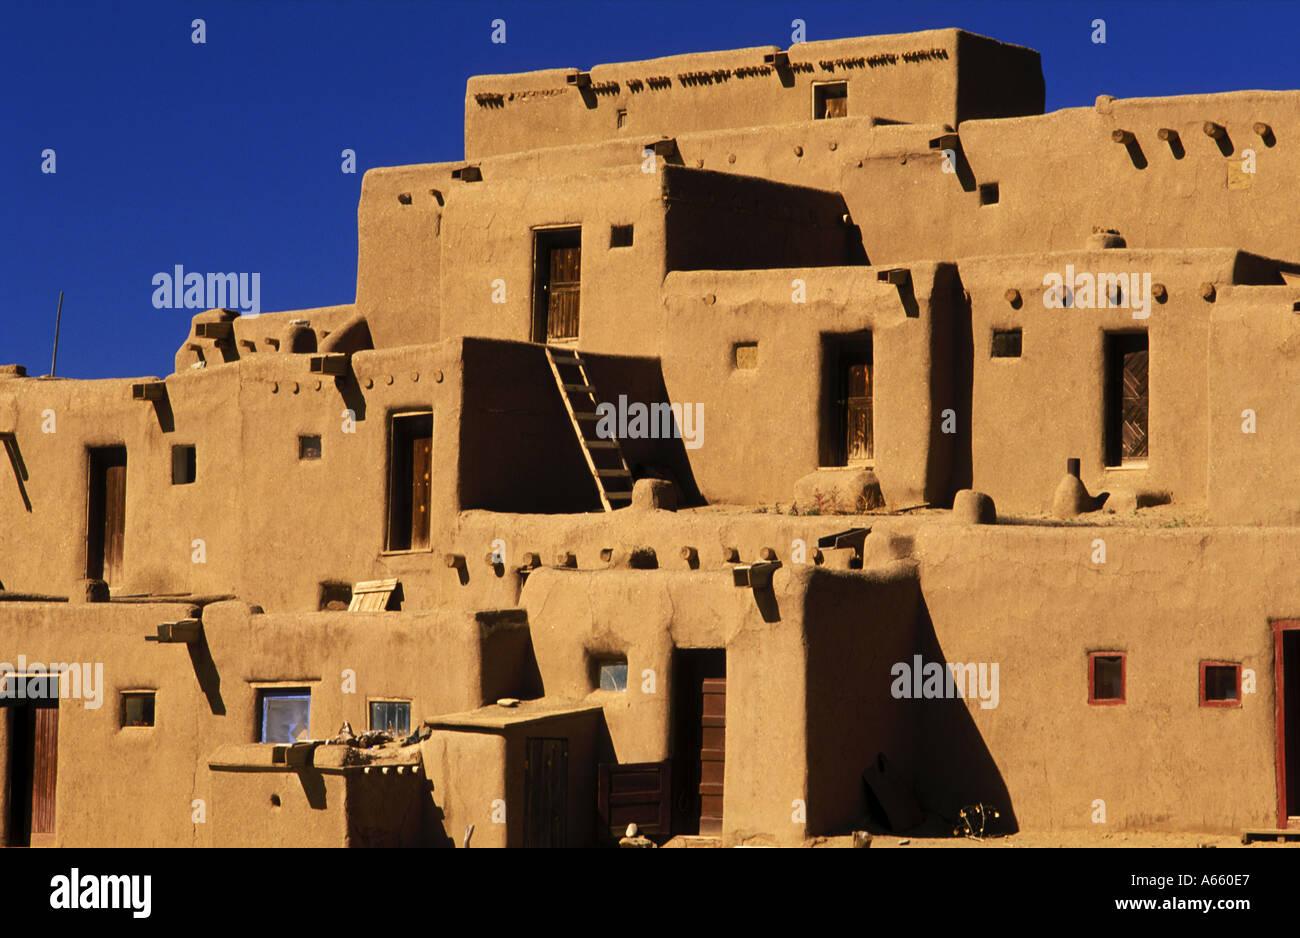 USA New Mexico Taos Pueblo continuous habitation since A D 1350 - Stock Image